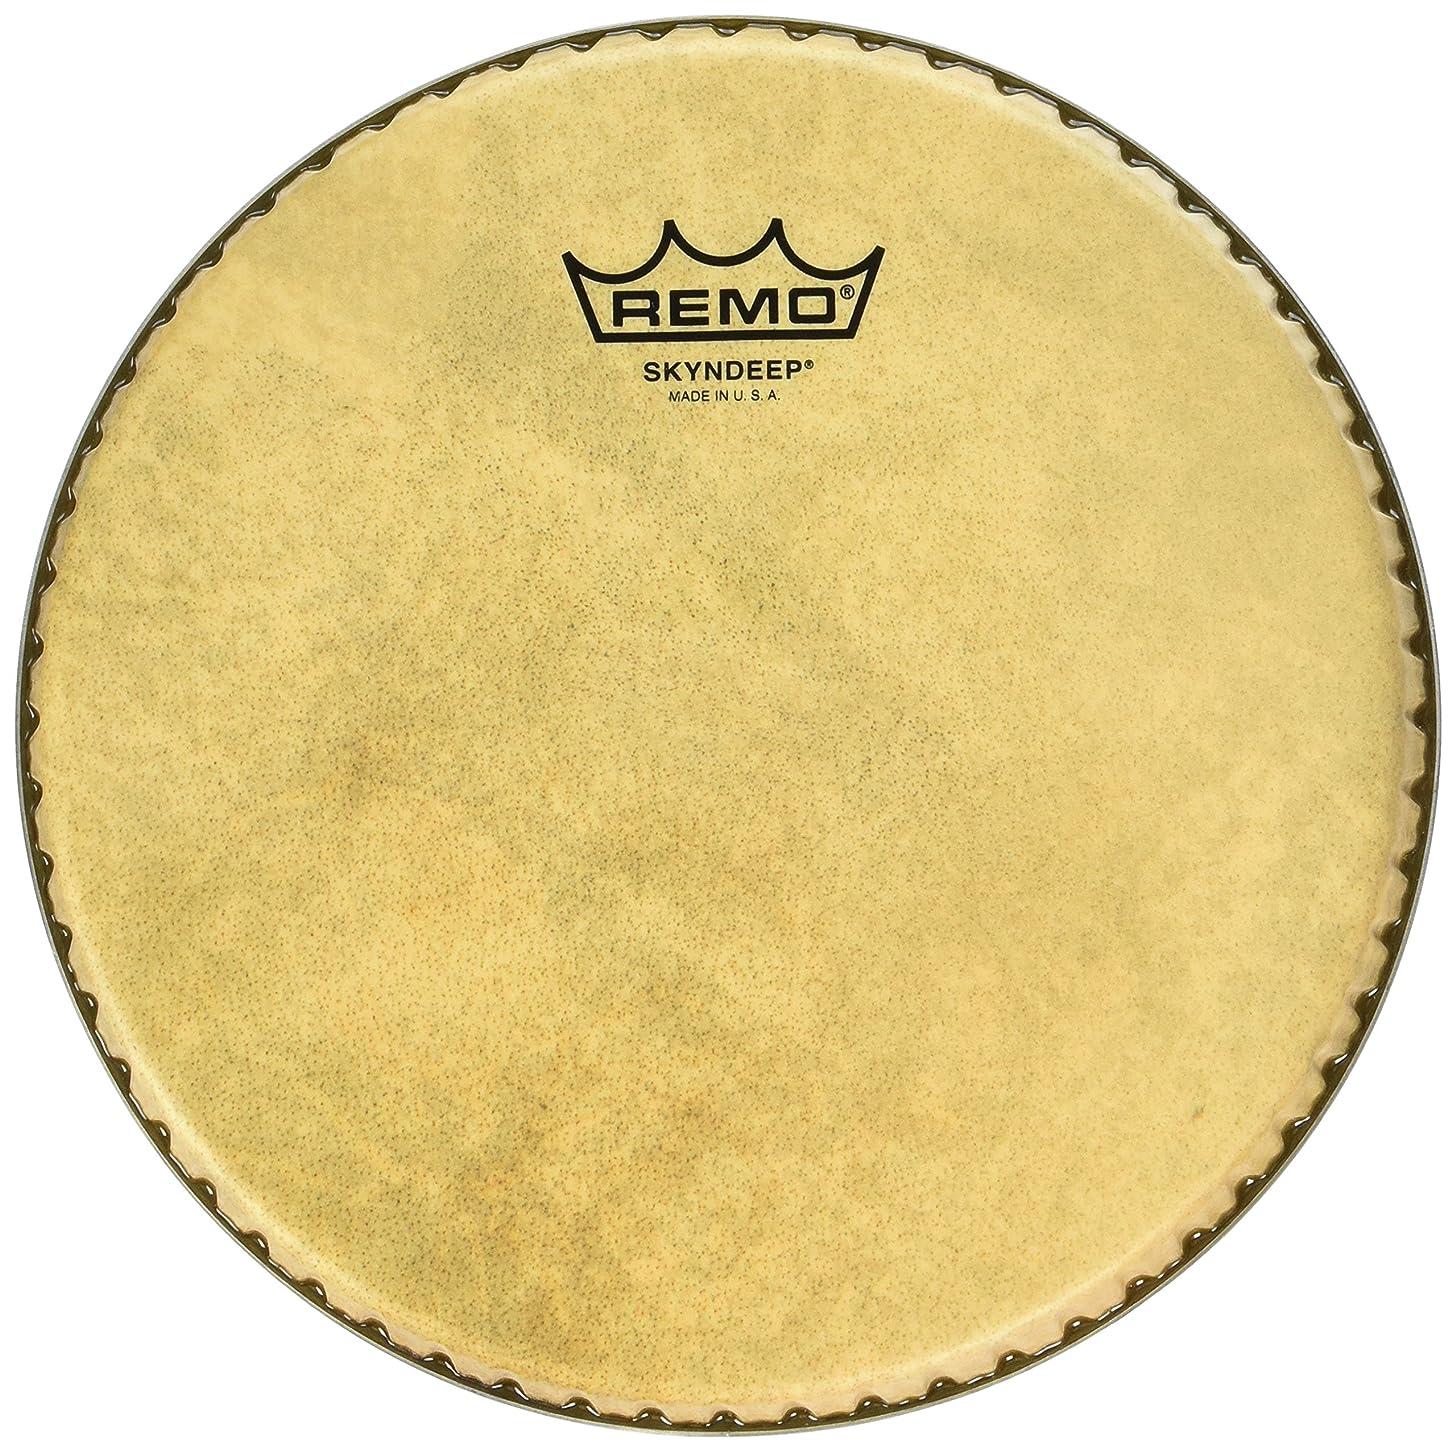 Remo S-Series Skyndeep Bongo Drumhead - Calfskin Graphic, 8